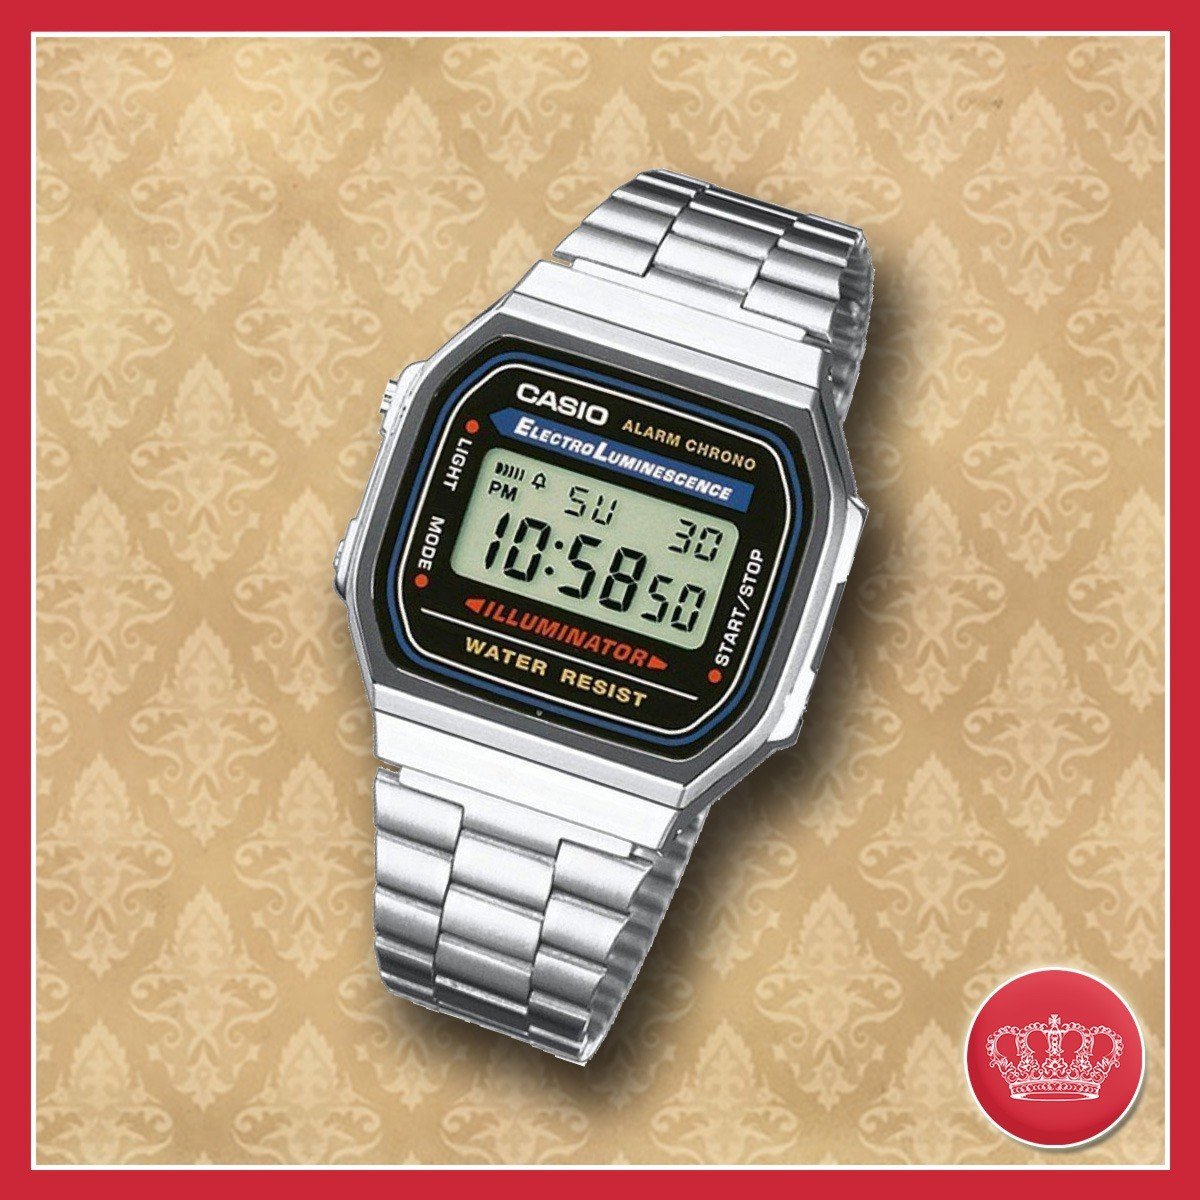 dbacac0c09b9 reloj casio unisex retro vintage a168wa + envio gratis. Cargando zoom.